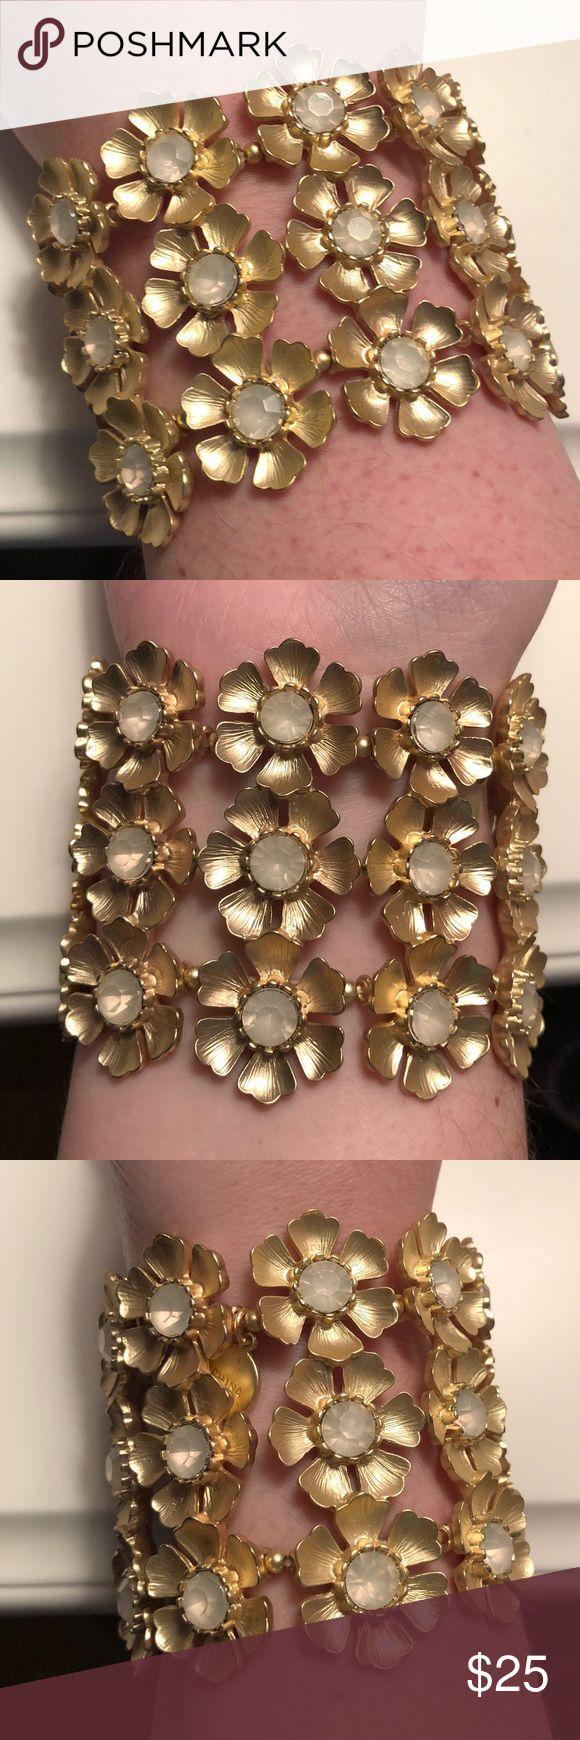 Susan Graver Flower Cuff Bracelet Never worn! Susan Graver Jewelry Bracelets